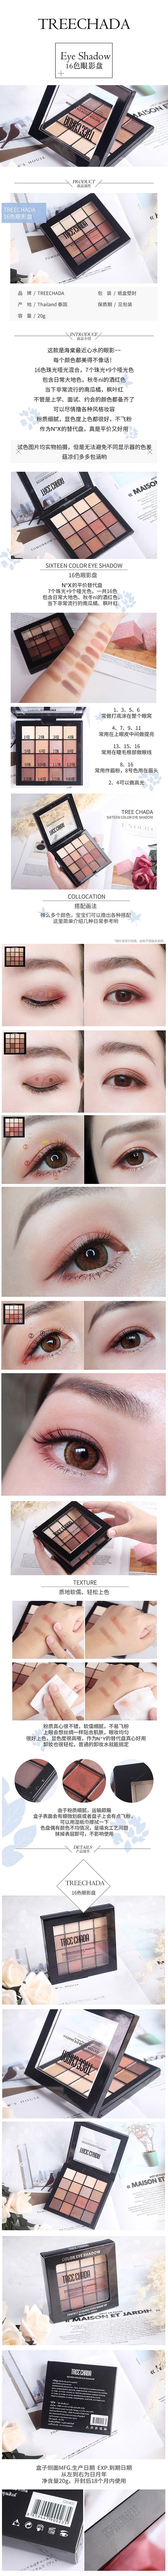 泰国TREECHADA十六色眼影盘-1.jpg